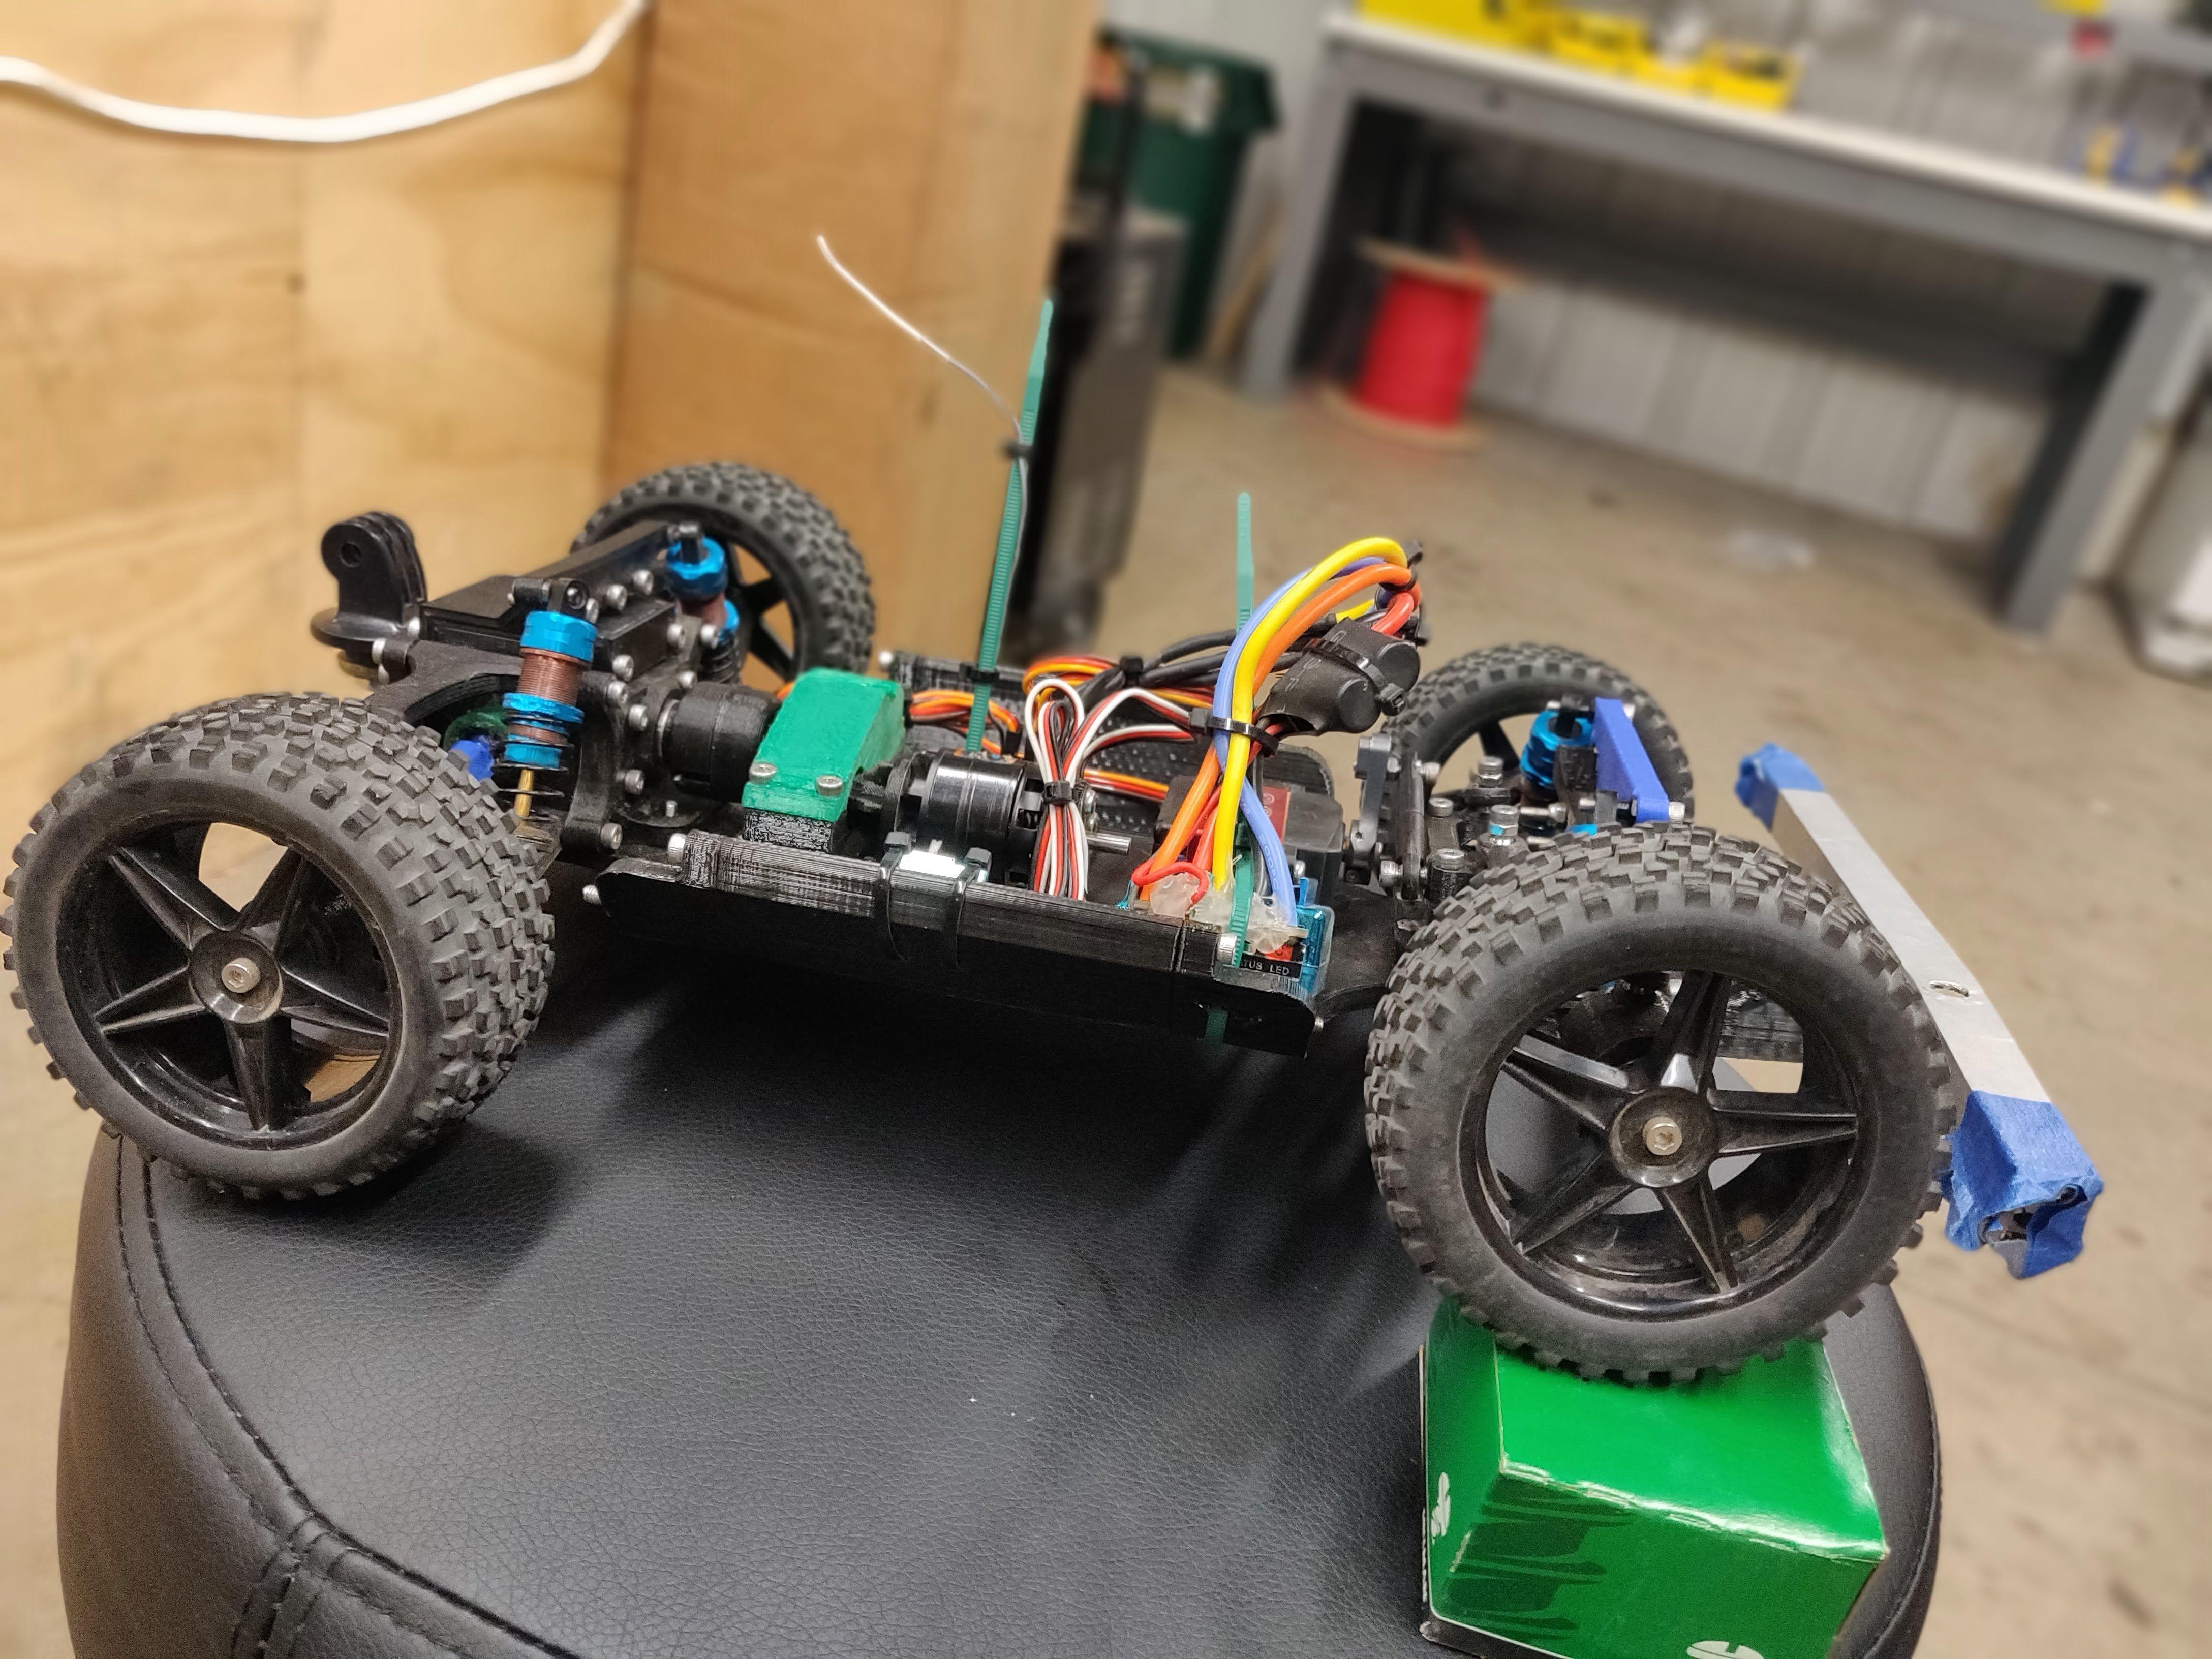 Rc Car I Made With My 3d Printer Super Cool Car 3d Printing Rc Cars